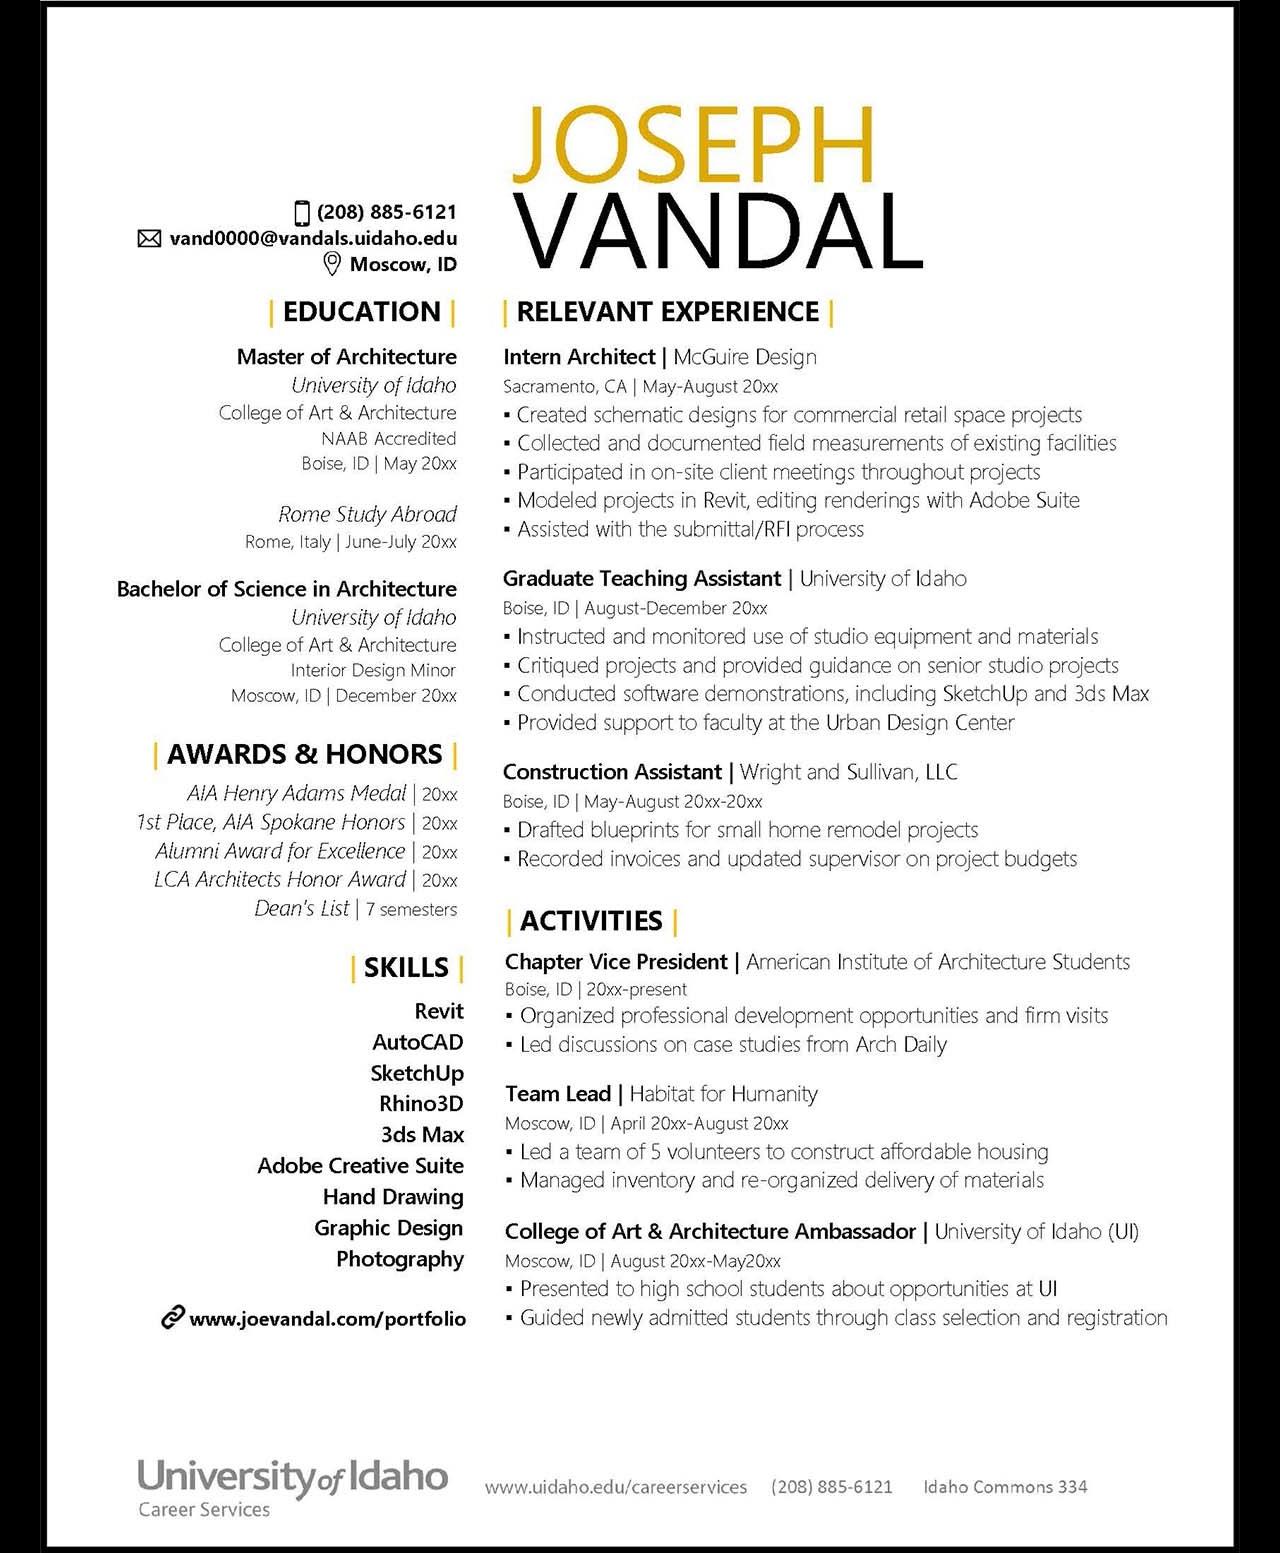 Resumes And Cvs Career Services University Of Idaho